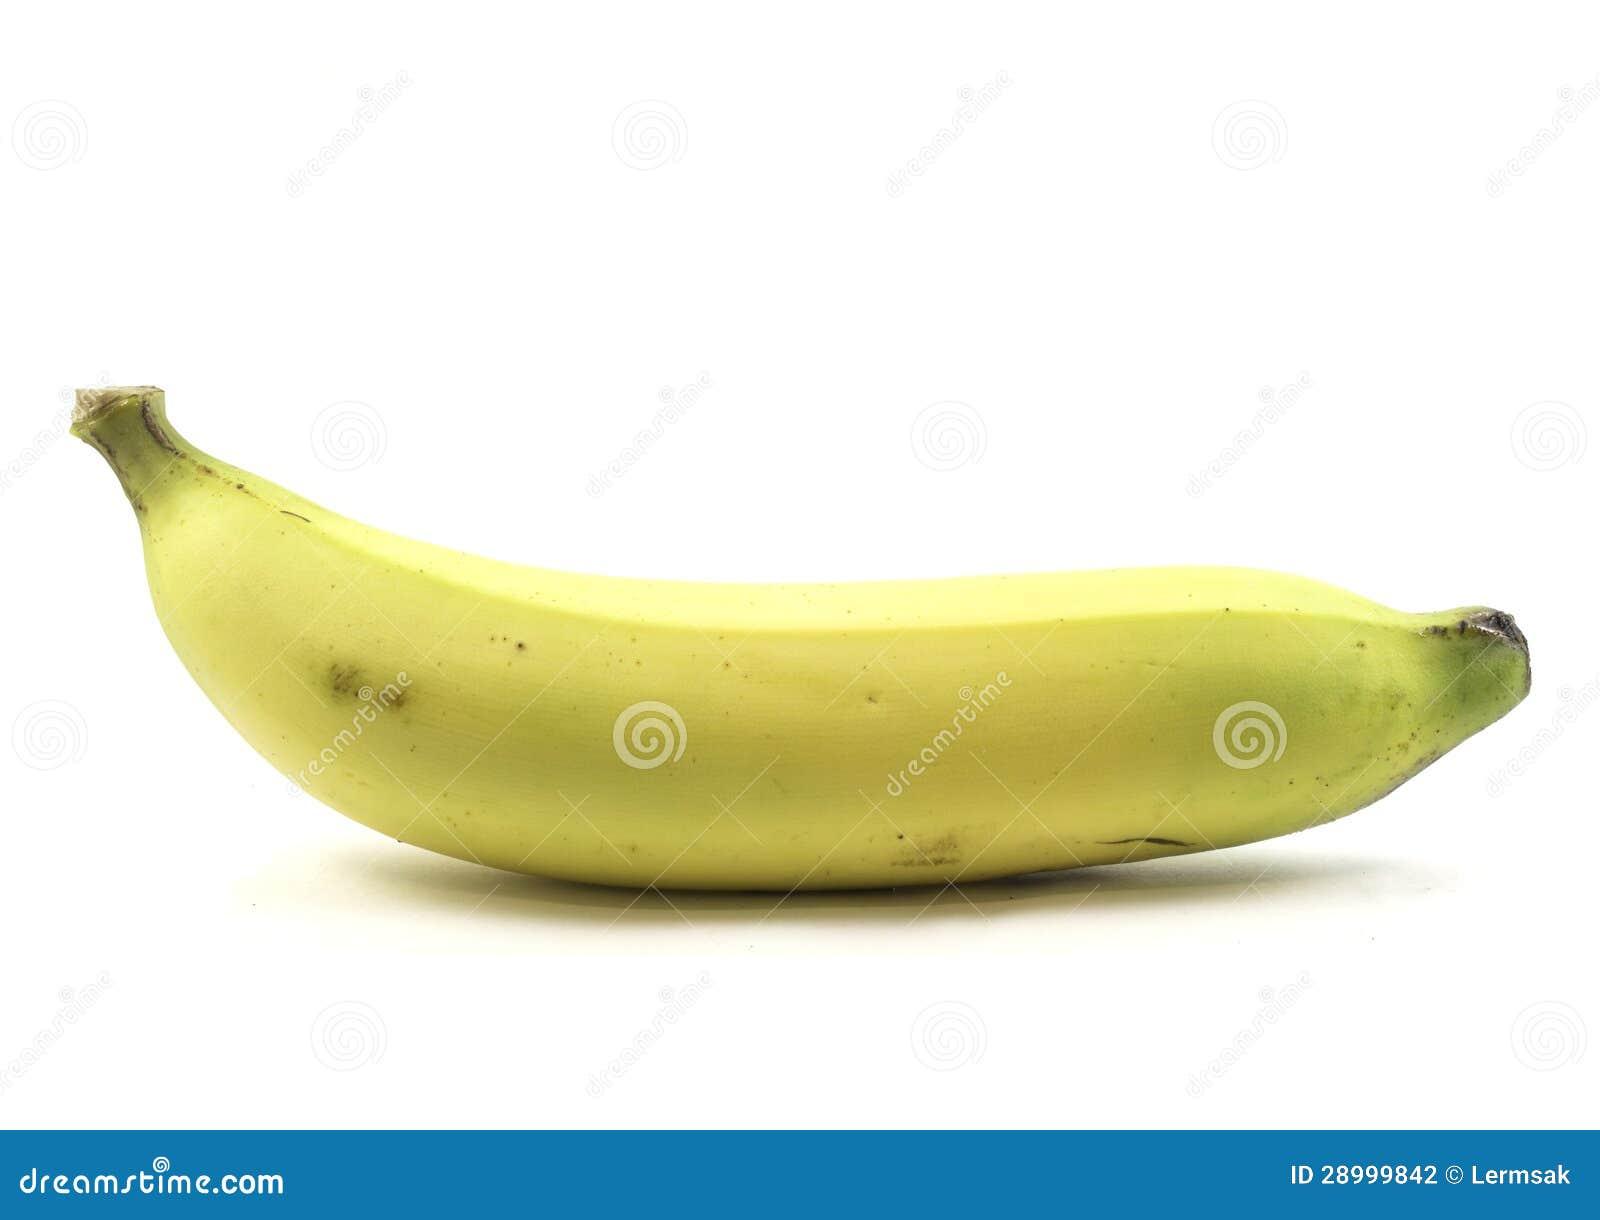 Banana Cultivation Practices: Start a Banana Plantation